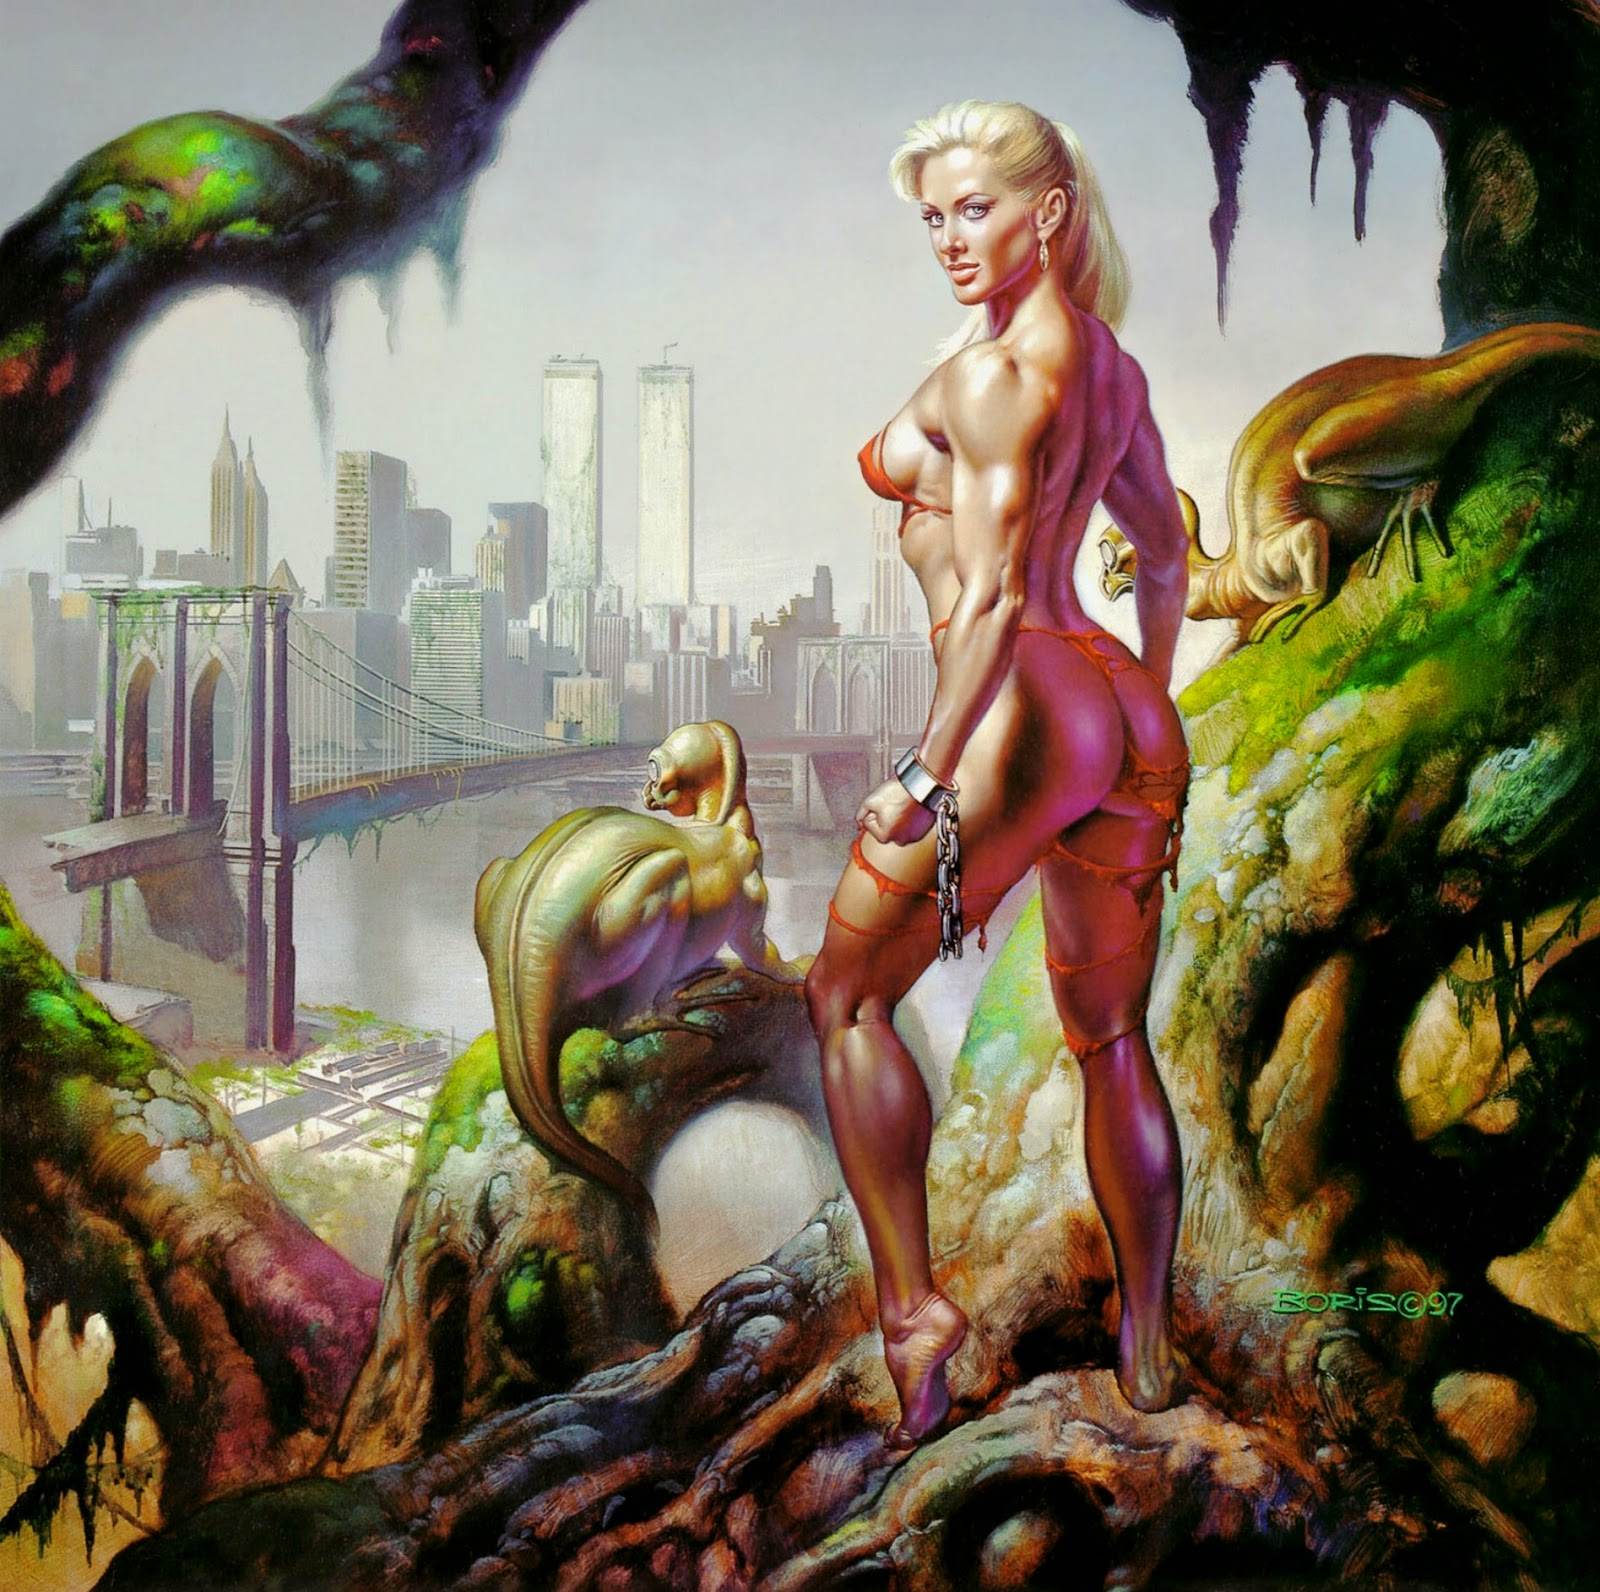 Sci fi mujer desnuda